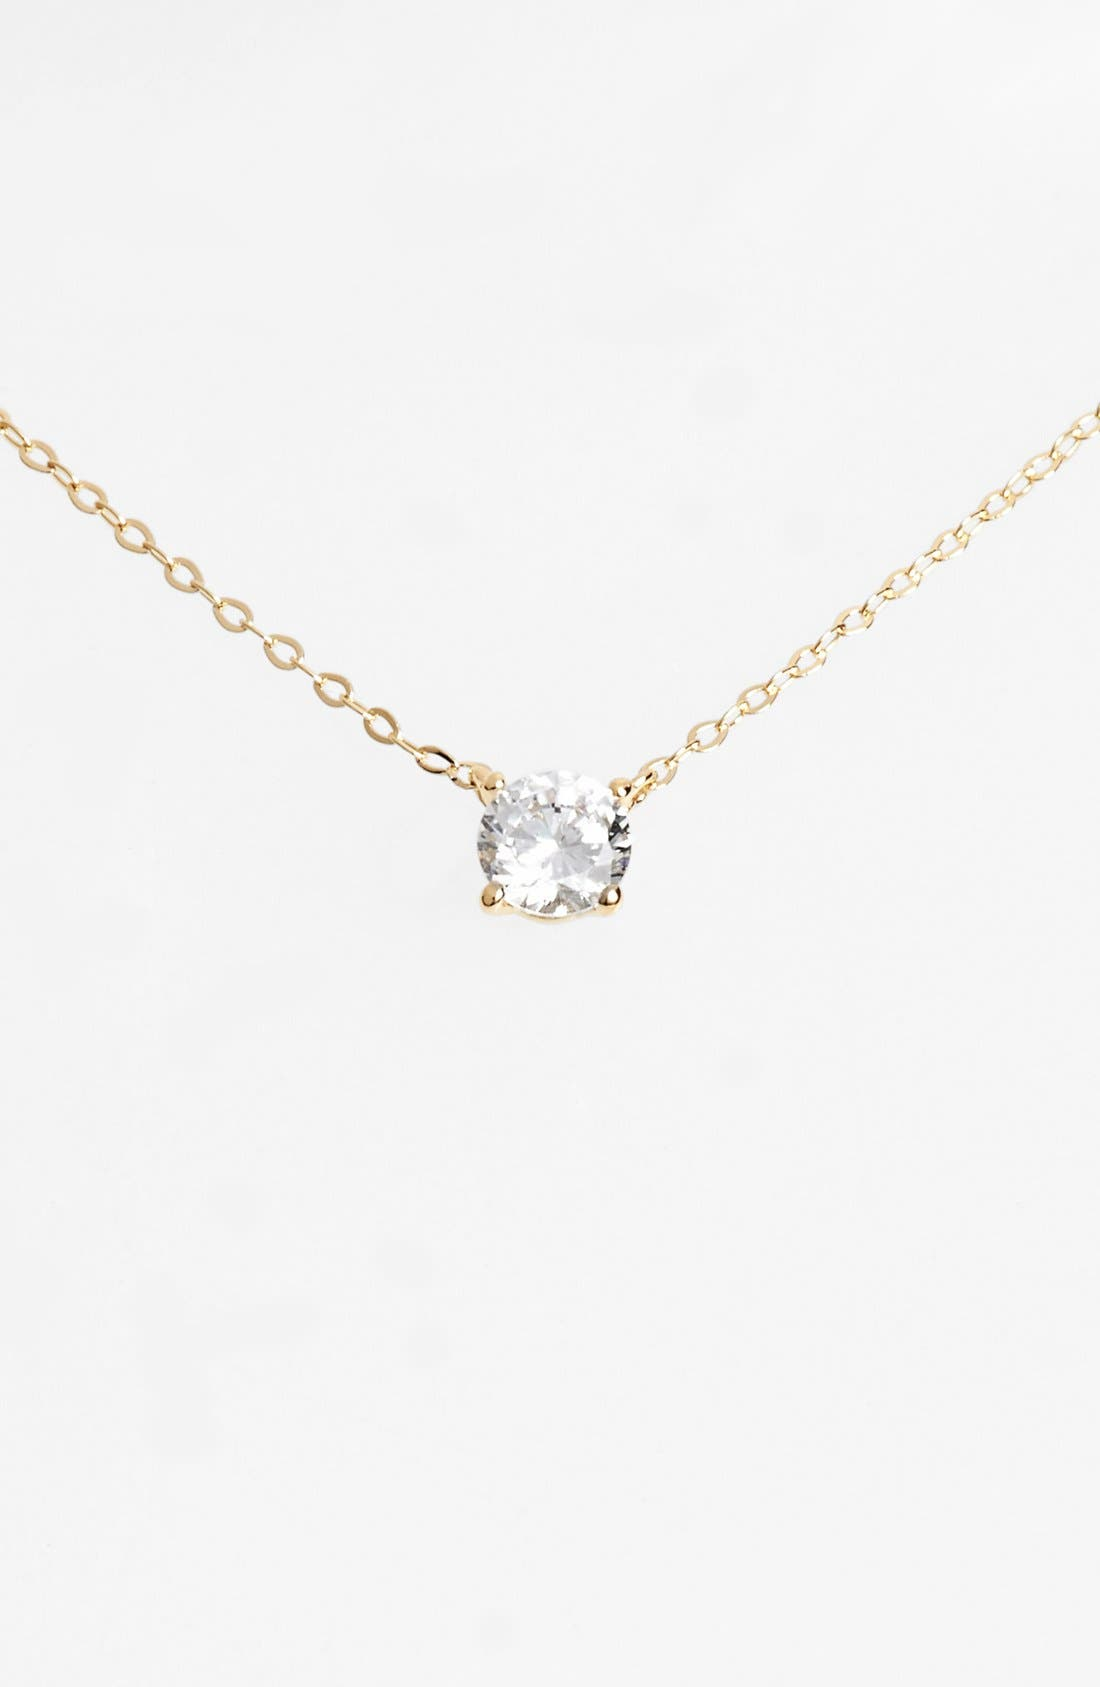 Nadri cubic zirconia pendant necklace gold modesens nadri cubic zirconia pendant necklace gold aloadofball Images